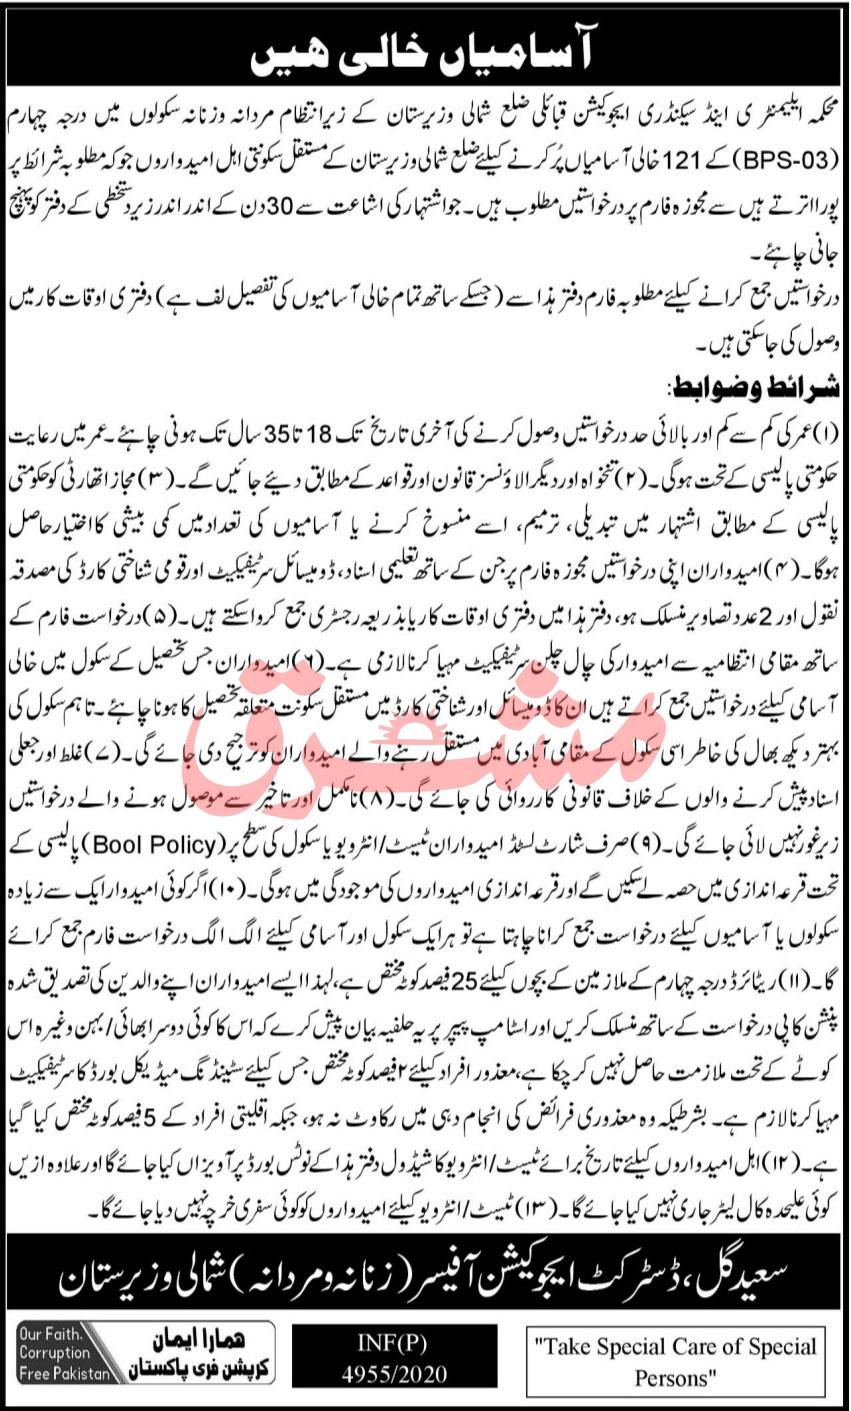 Govt School Jobs 2021 - Elementary & Secondary Education Department Jobs 2021 - Government of KPK Jobs 2021 - North Waziristan Latest Jobs 2021